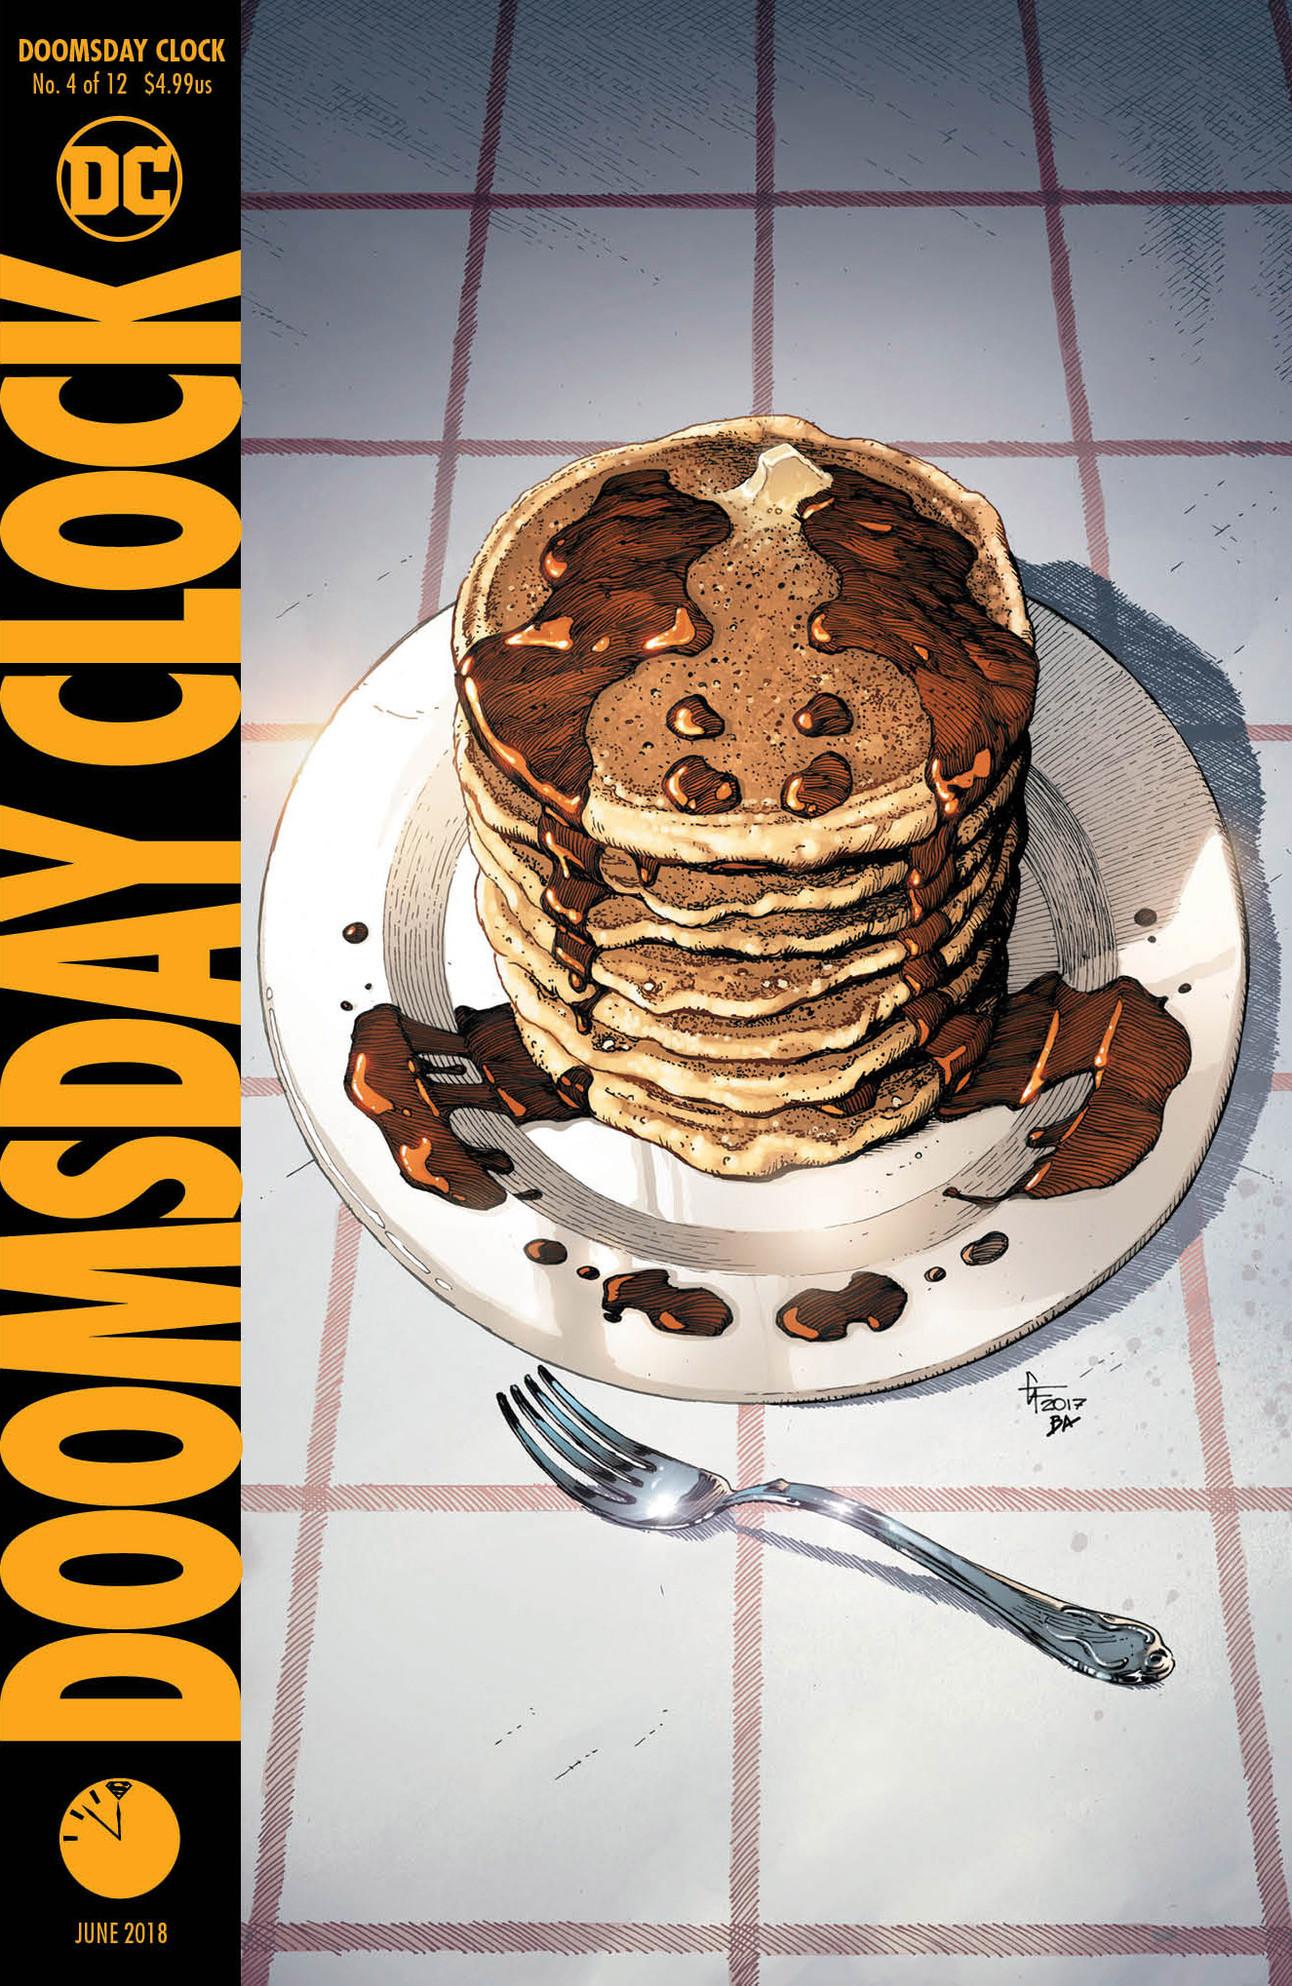 dc_doomsday_clock_4_cover.jpg